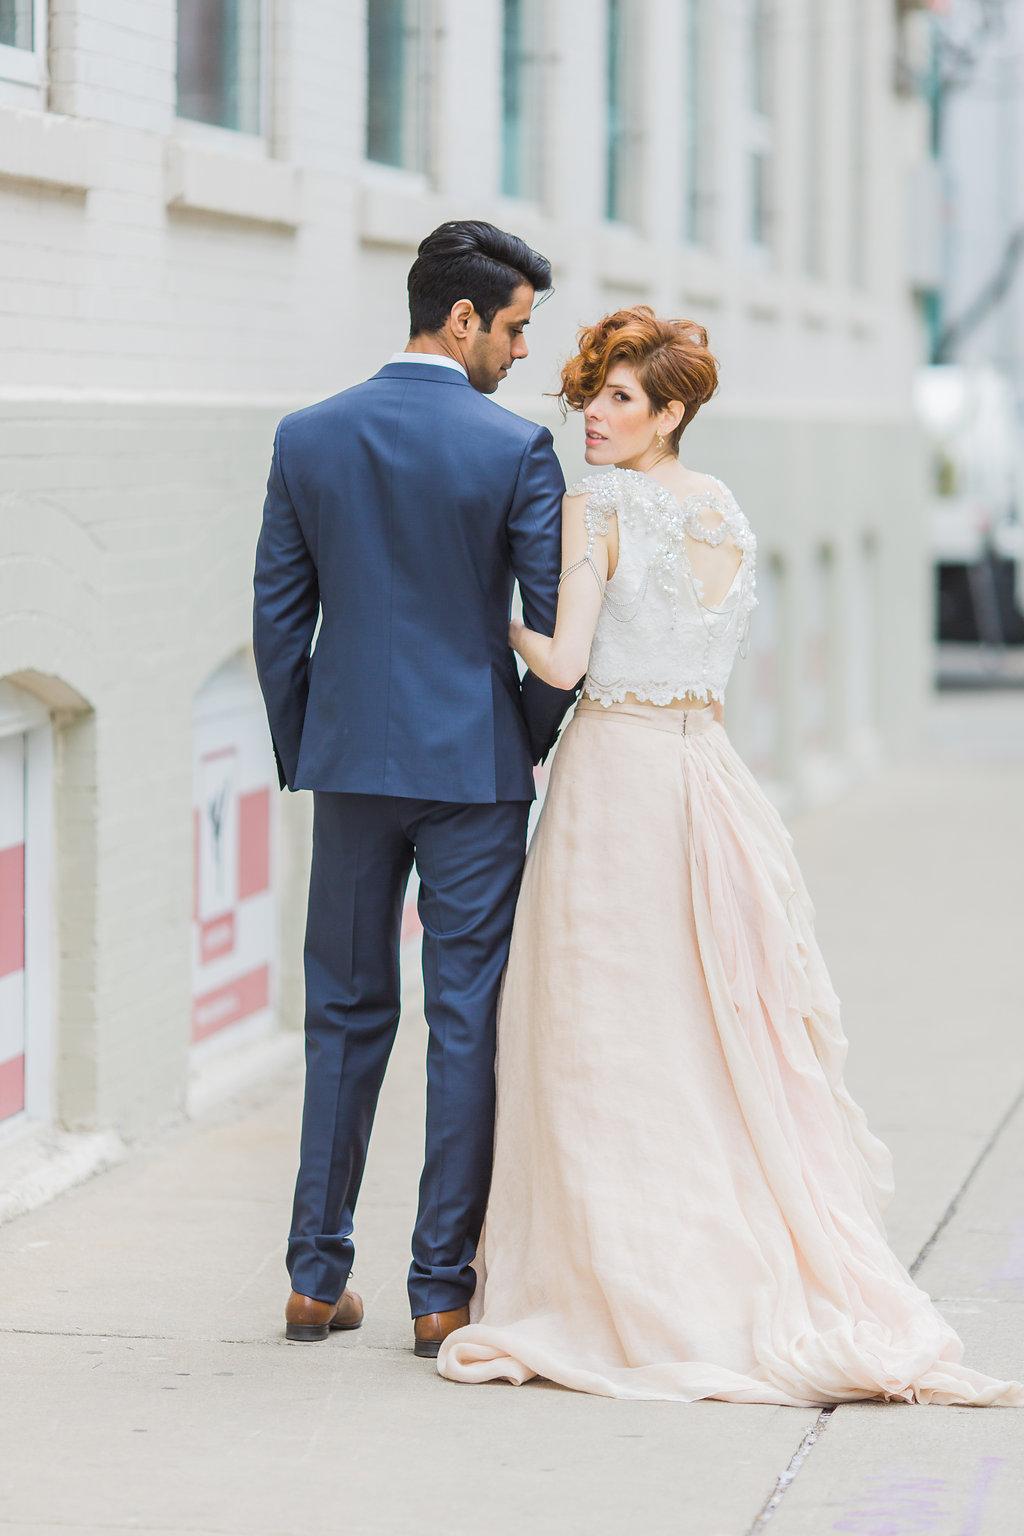 Phoebe Lo Events Toronto Wedding - Storys Building Urban Loft Paper Inspired Wedding 005.jpg